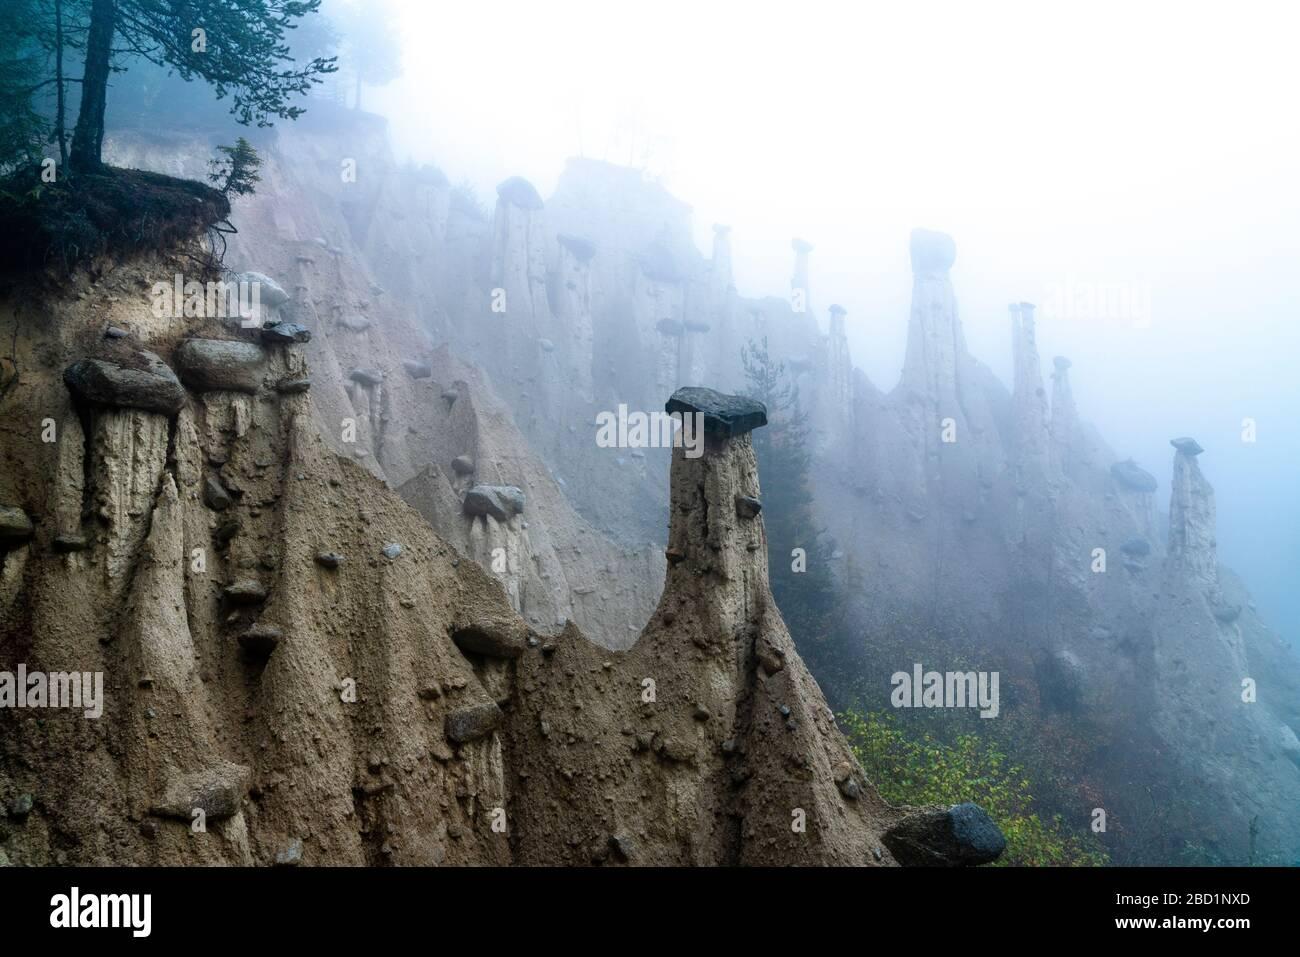 Brouillard sur la Terre Pyramides, Perca (percha), province de Bolzano, Tyrol du Sud, Italie, Europe Banque D'Images